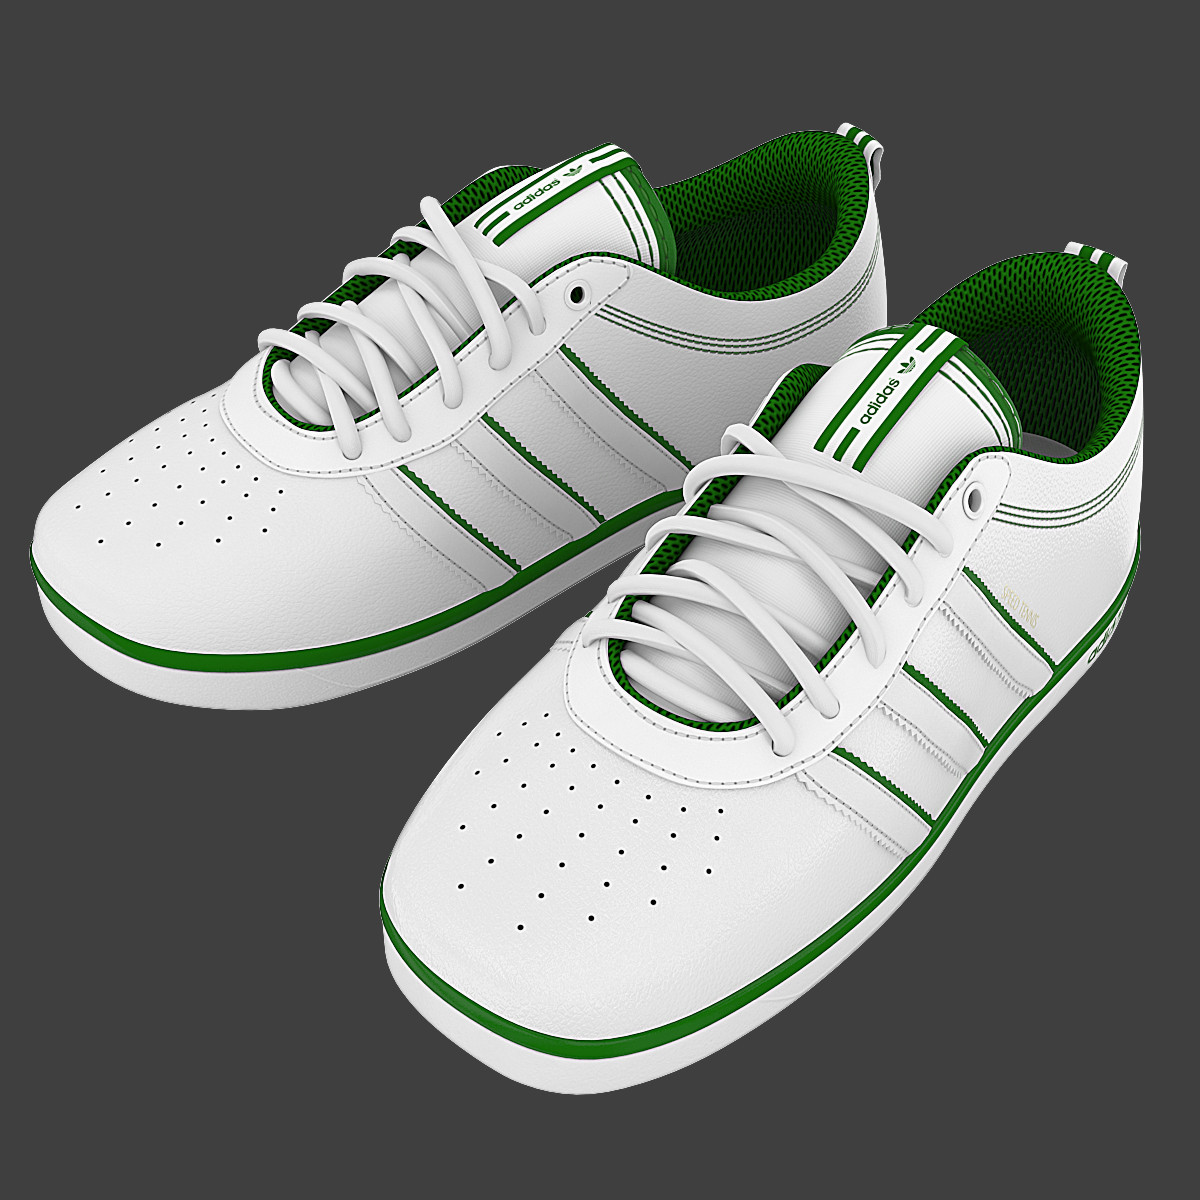 tennis_shoes_01.jpg